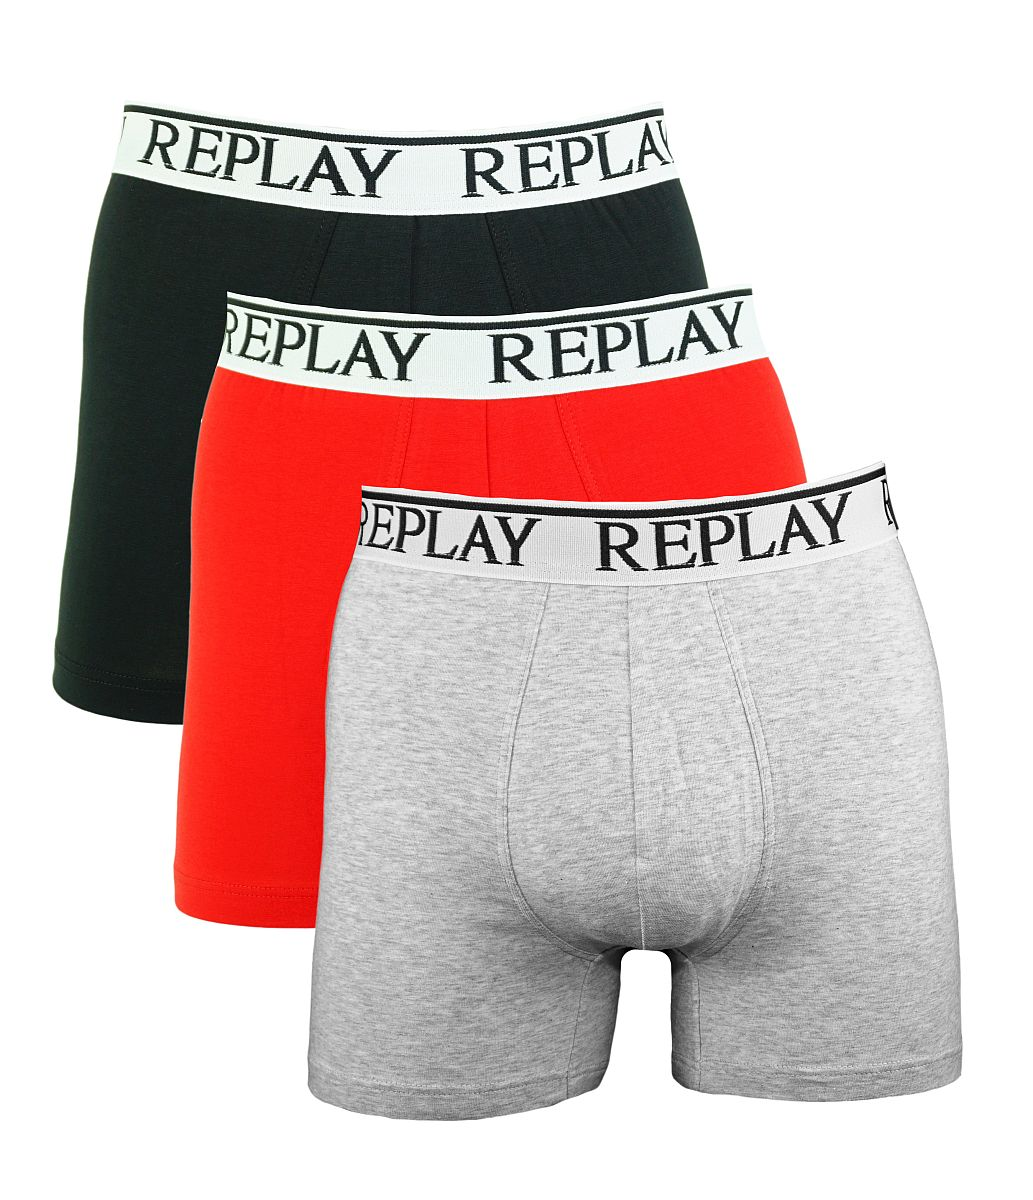 Replay 3er Pack Shorts Boxershorts M605001 E58 schwarz, rot, grau W18-RY1